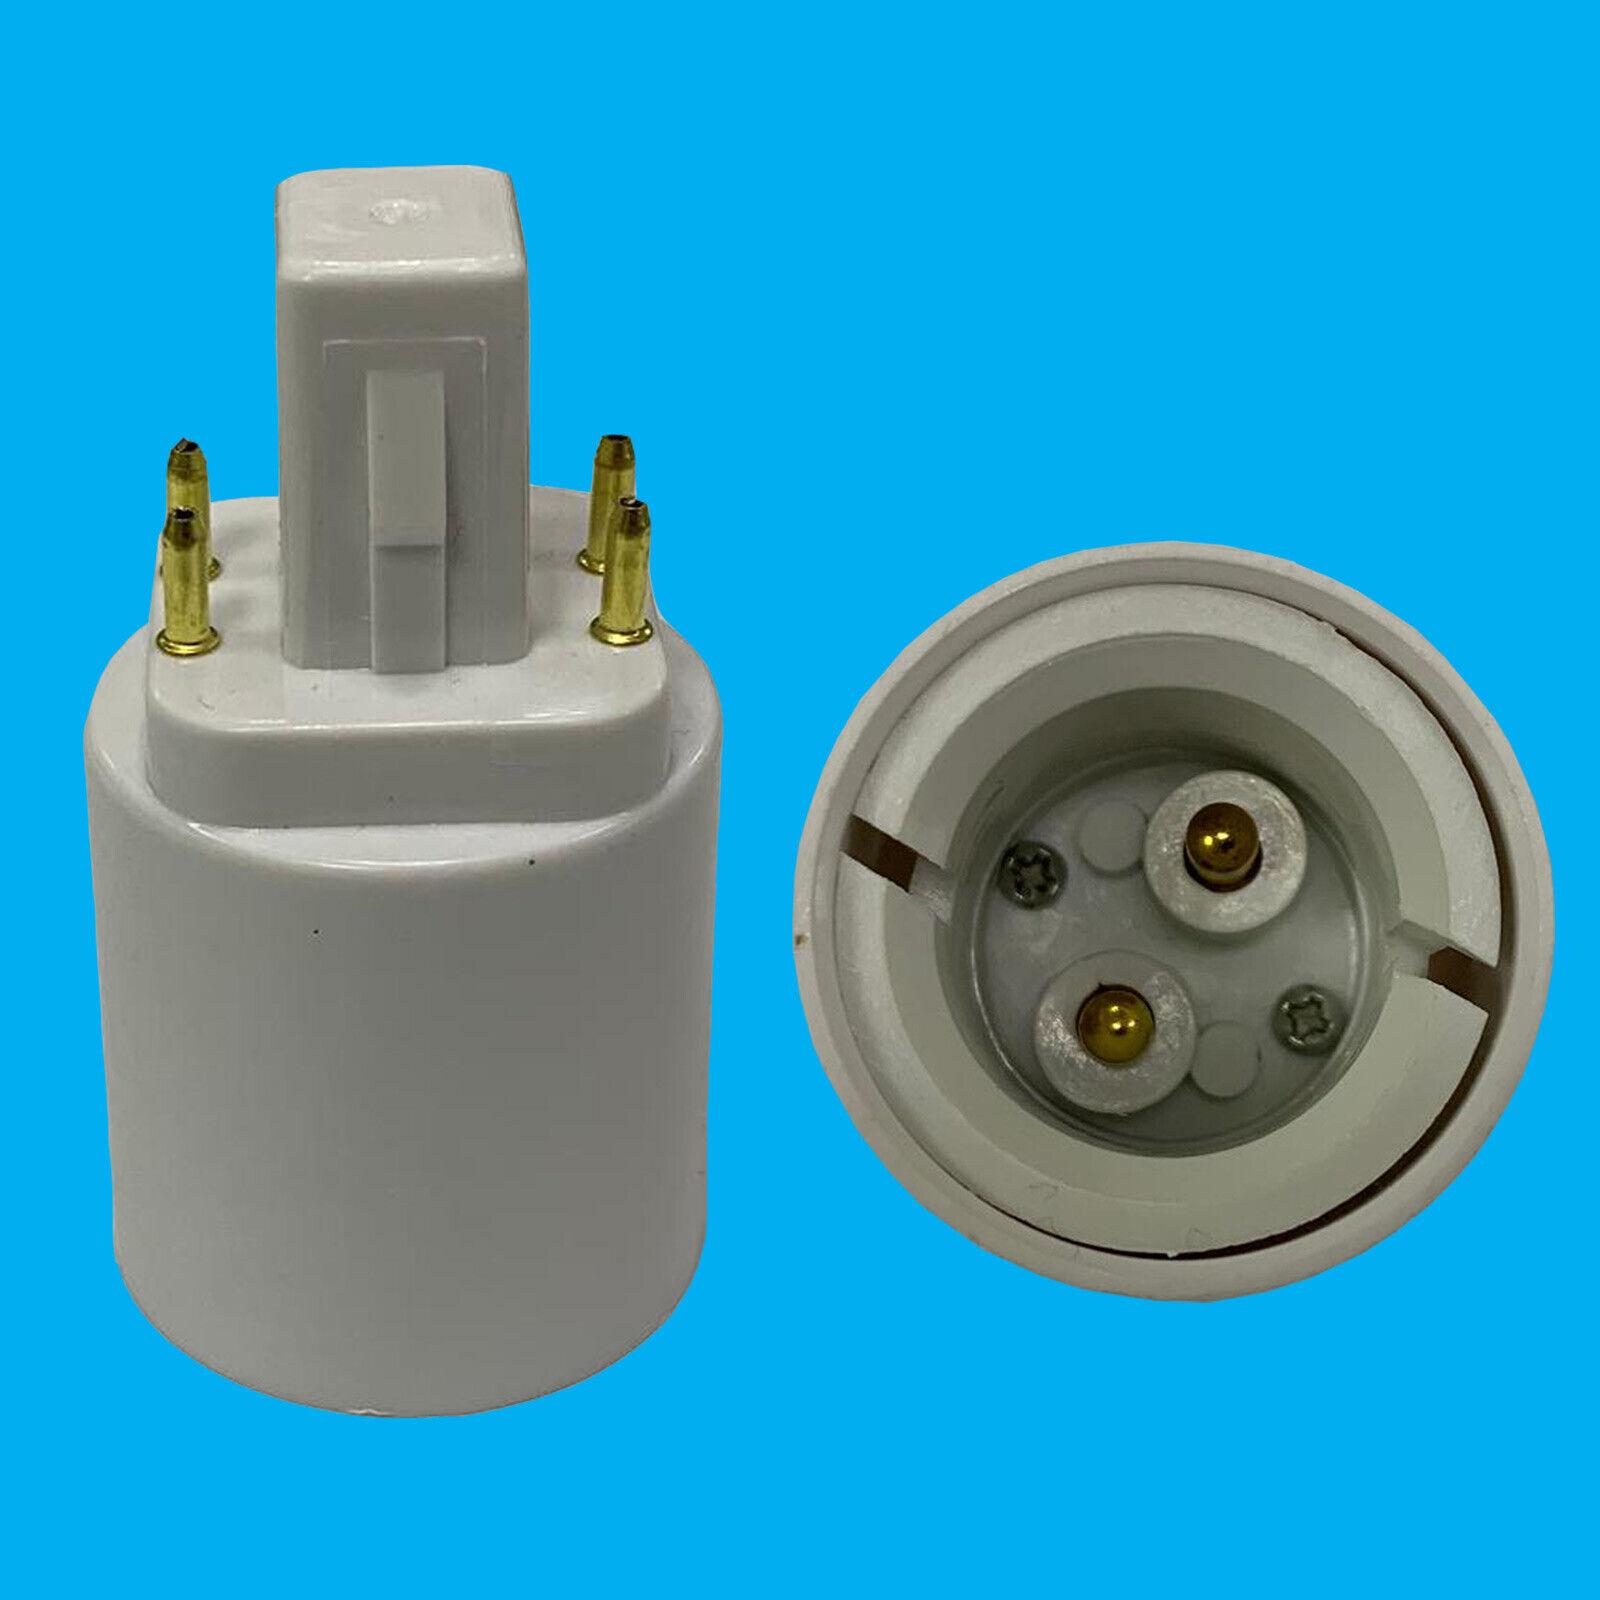 50x G24 2 Pin To BC B22 Bayonet Light Bulb Adaptor Lamp Fitting ConGrüner Holder